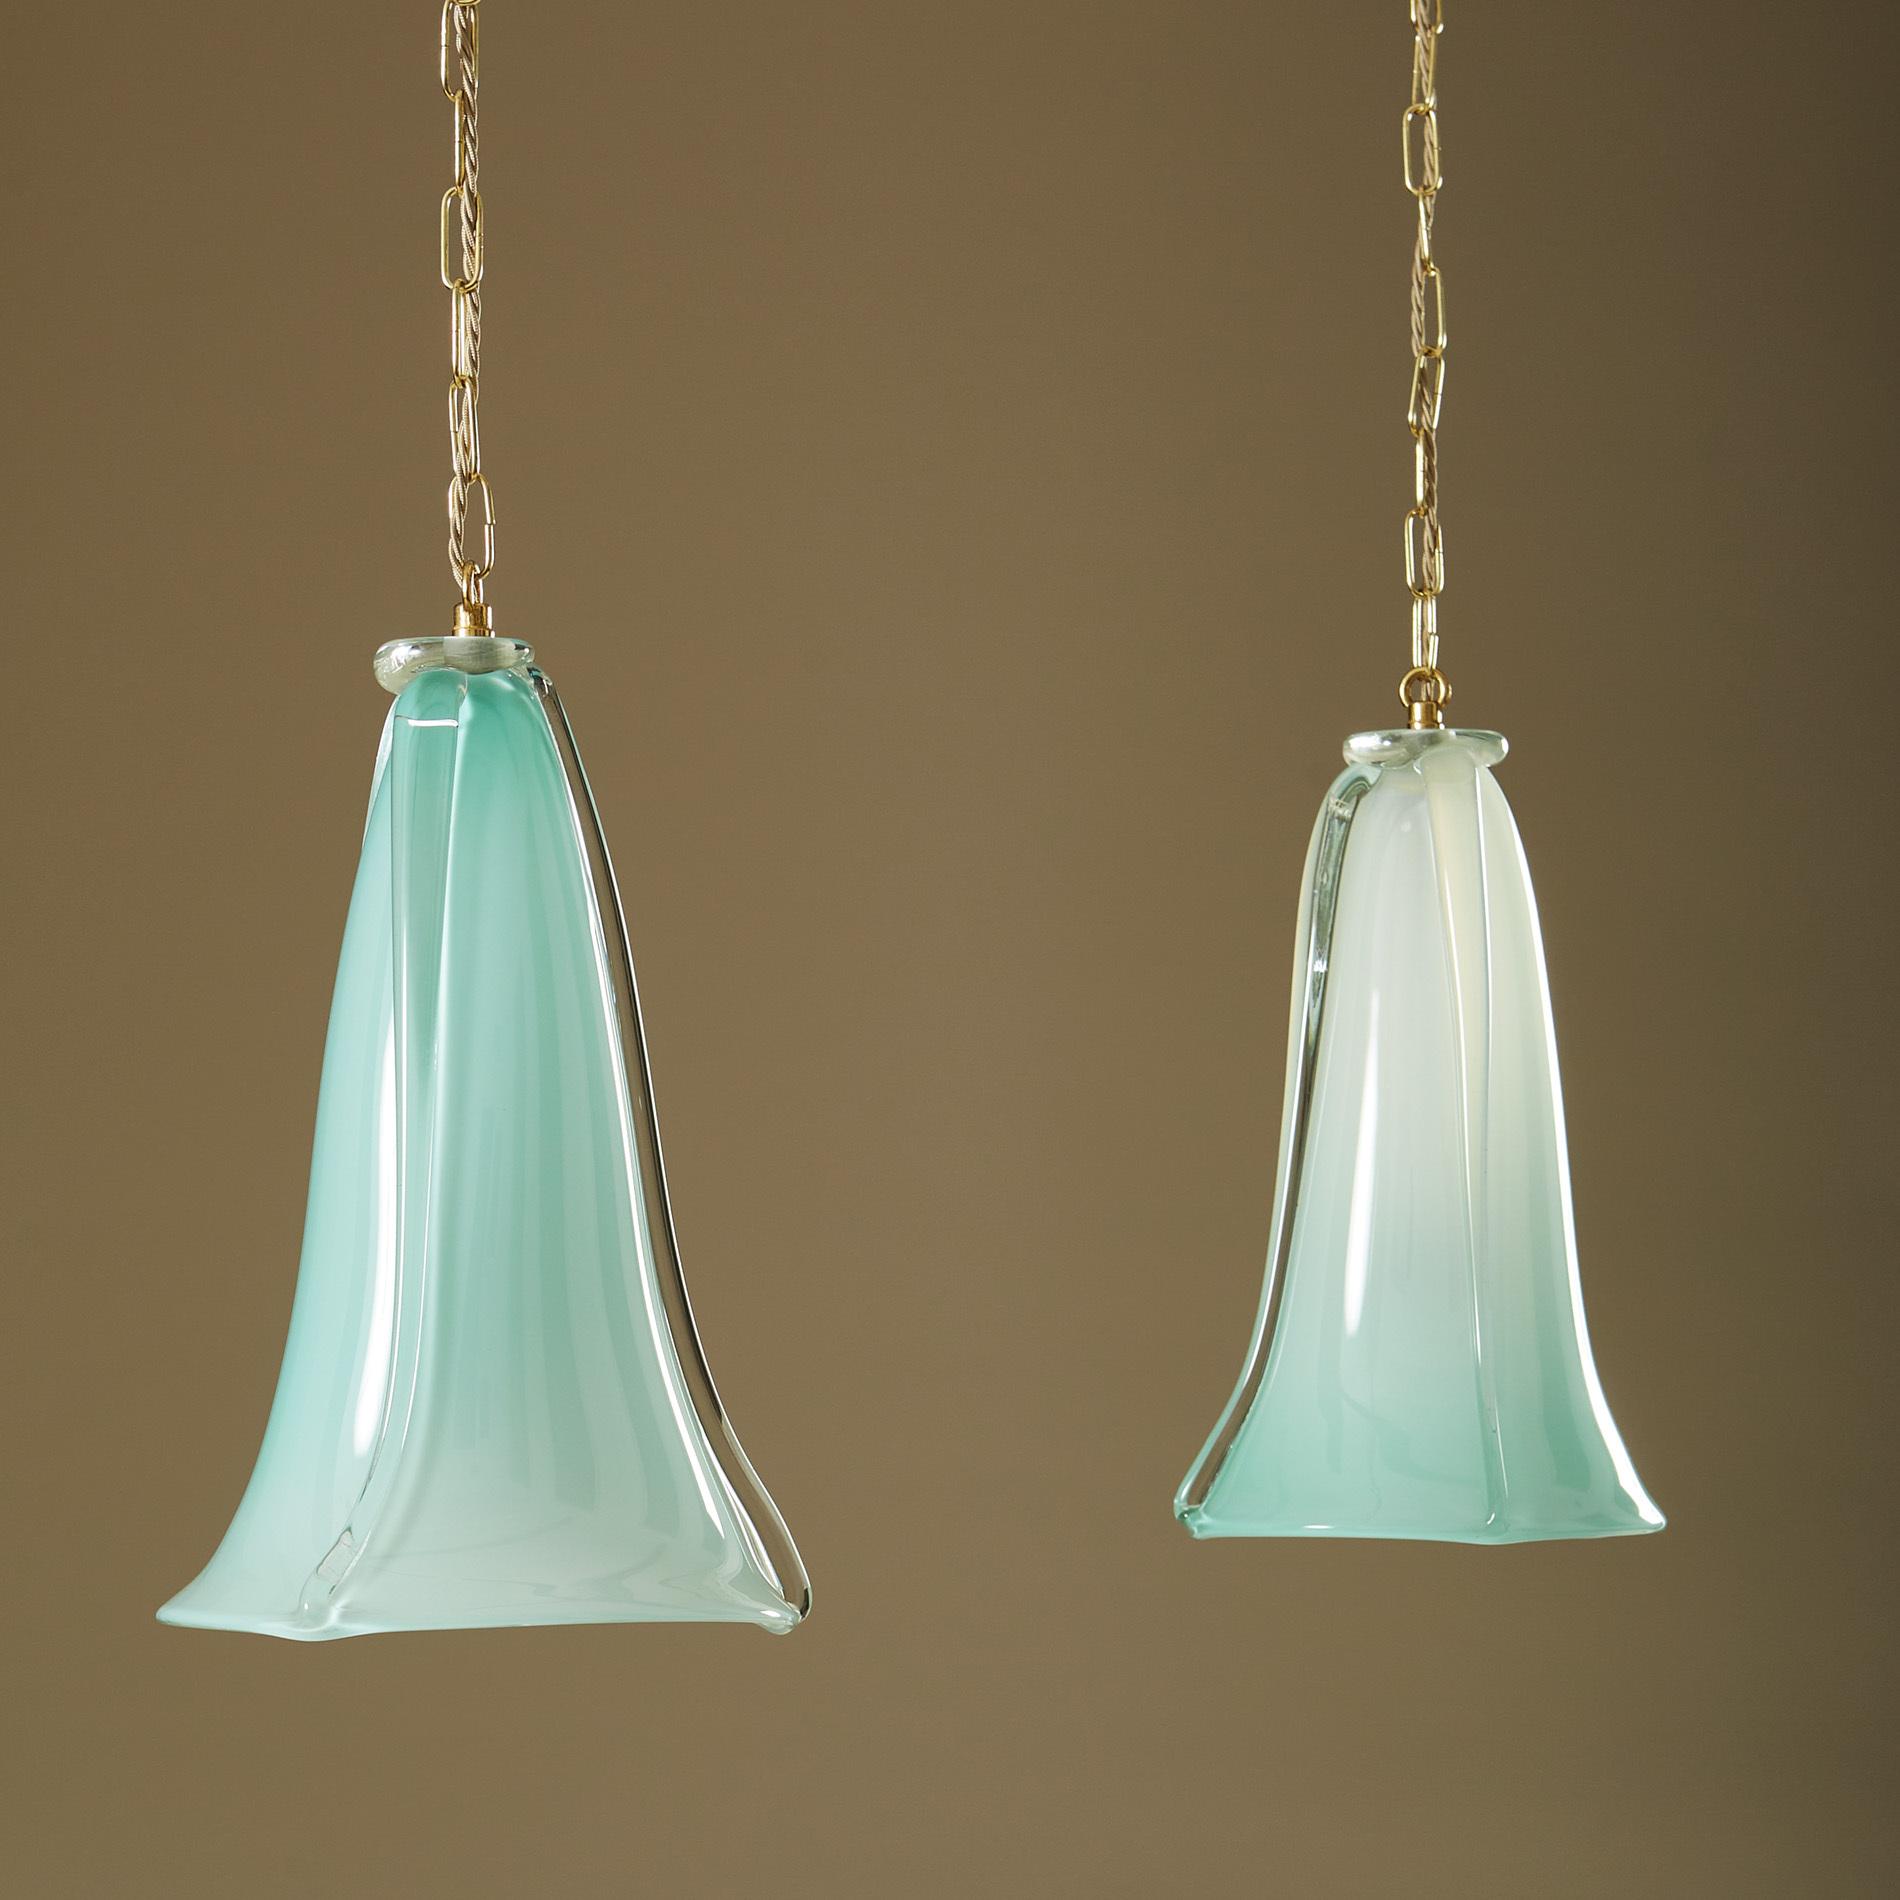 Turquoise Murano Pendants 241 V1